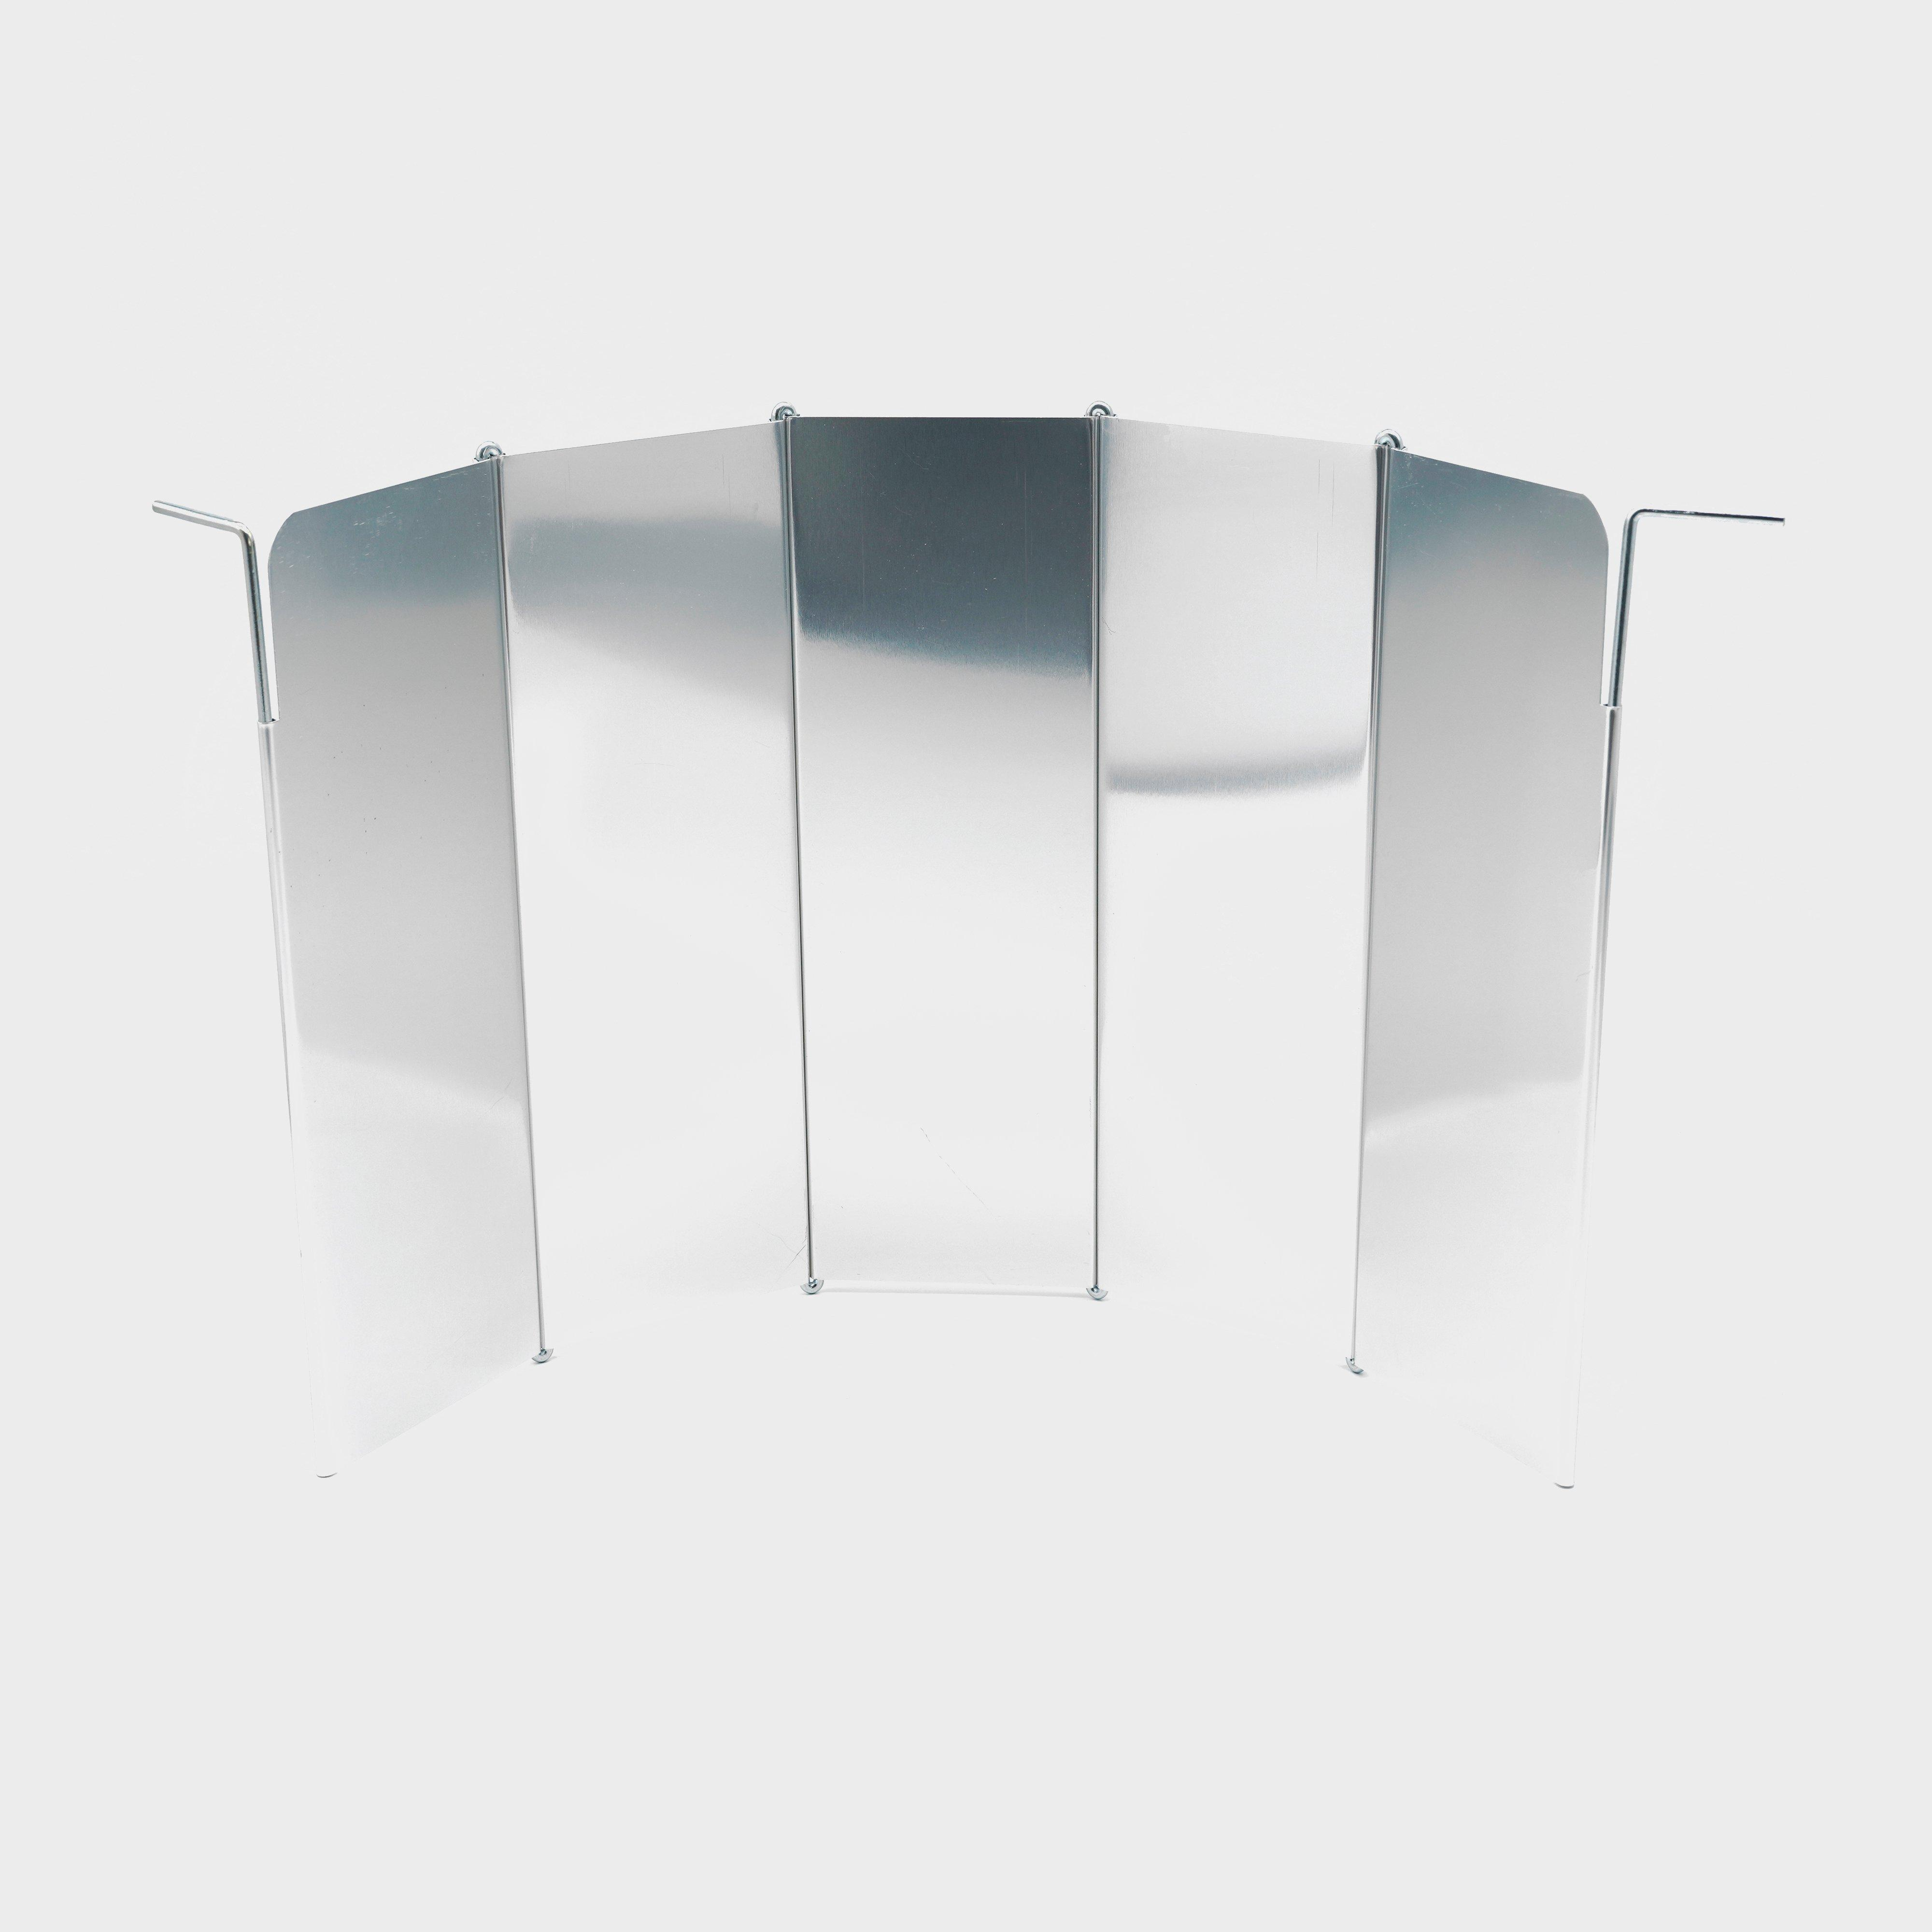 Image of Oex Windblocka - Silver/Slv, Silver/SLV